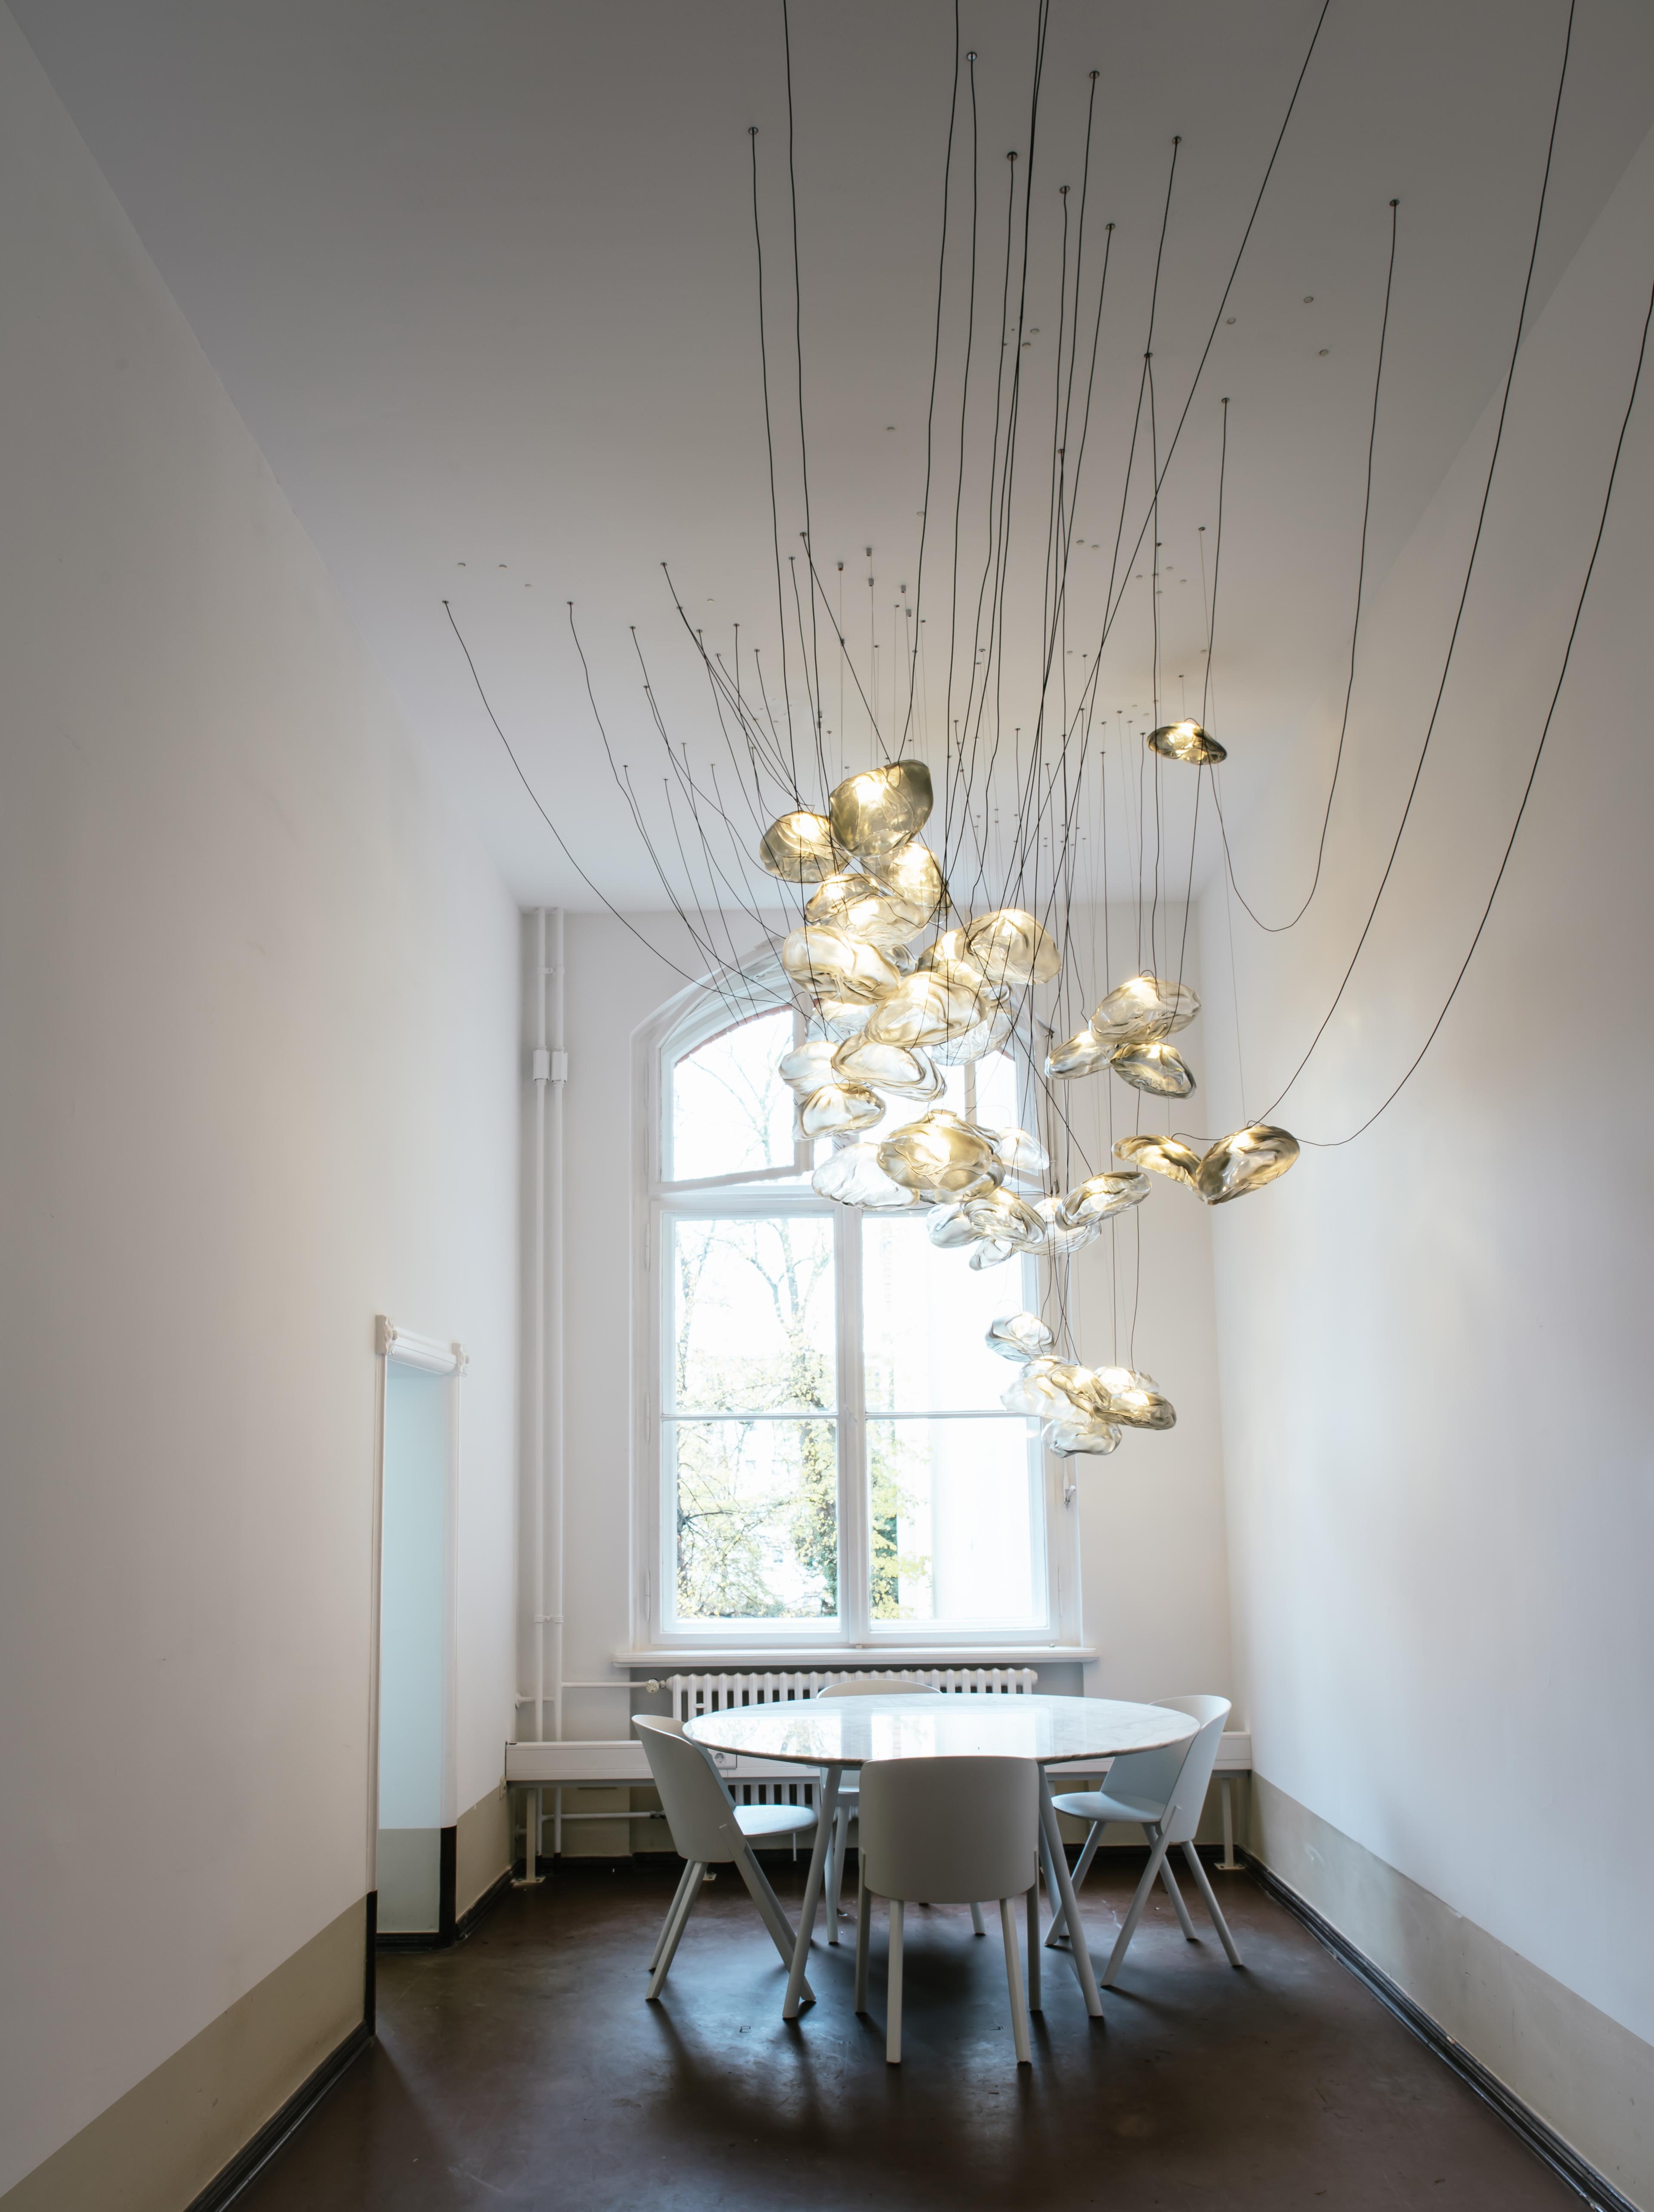 73 suspension lamp for Iconic design lamps